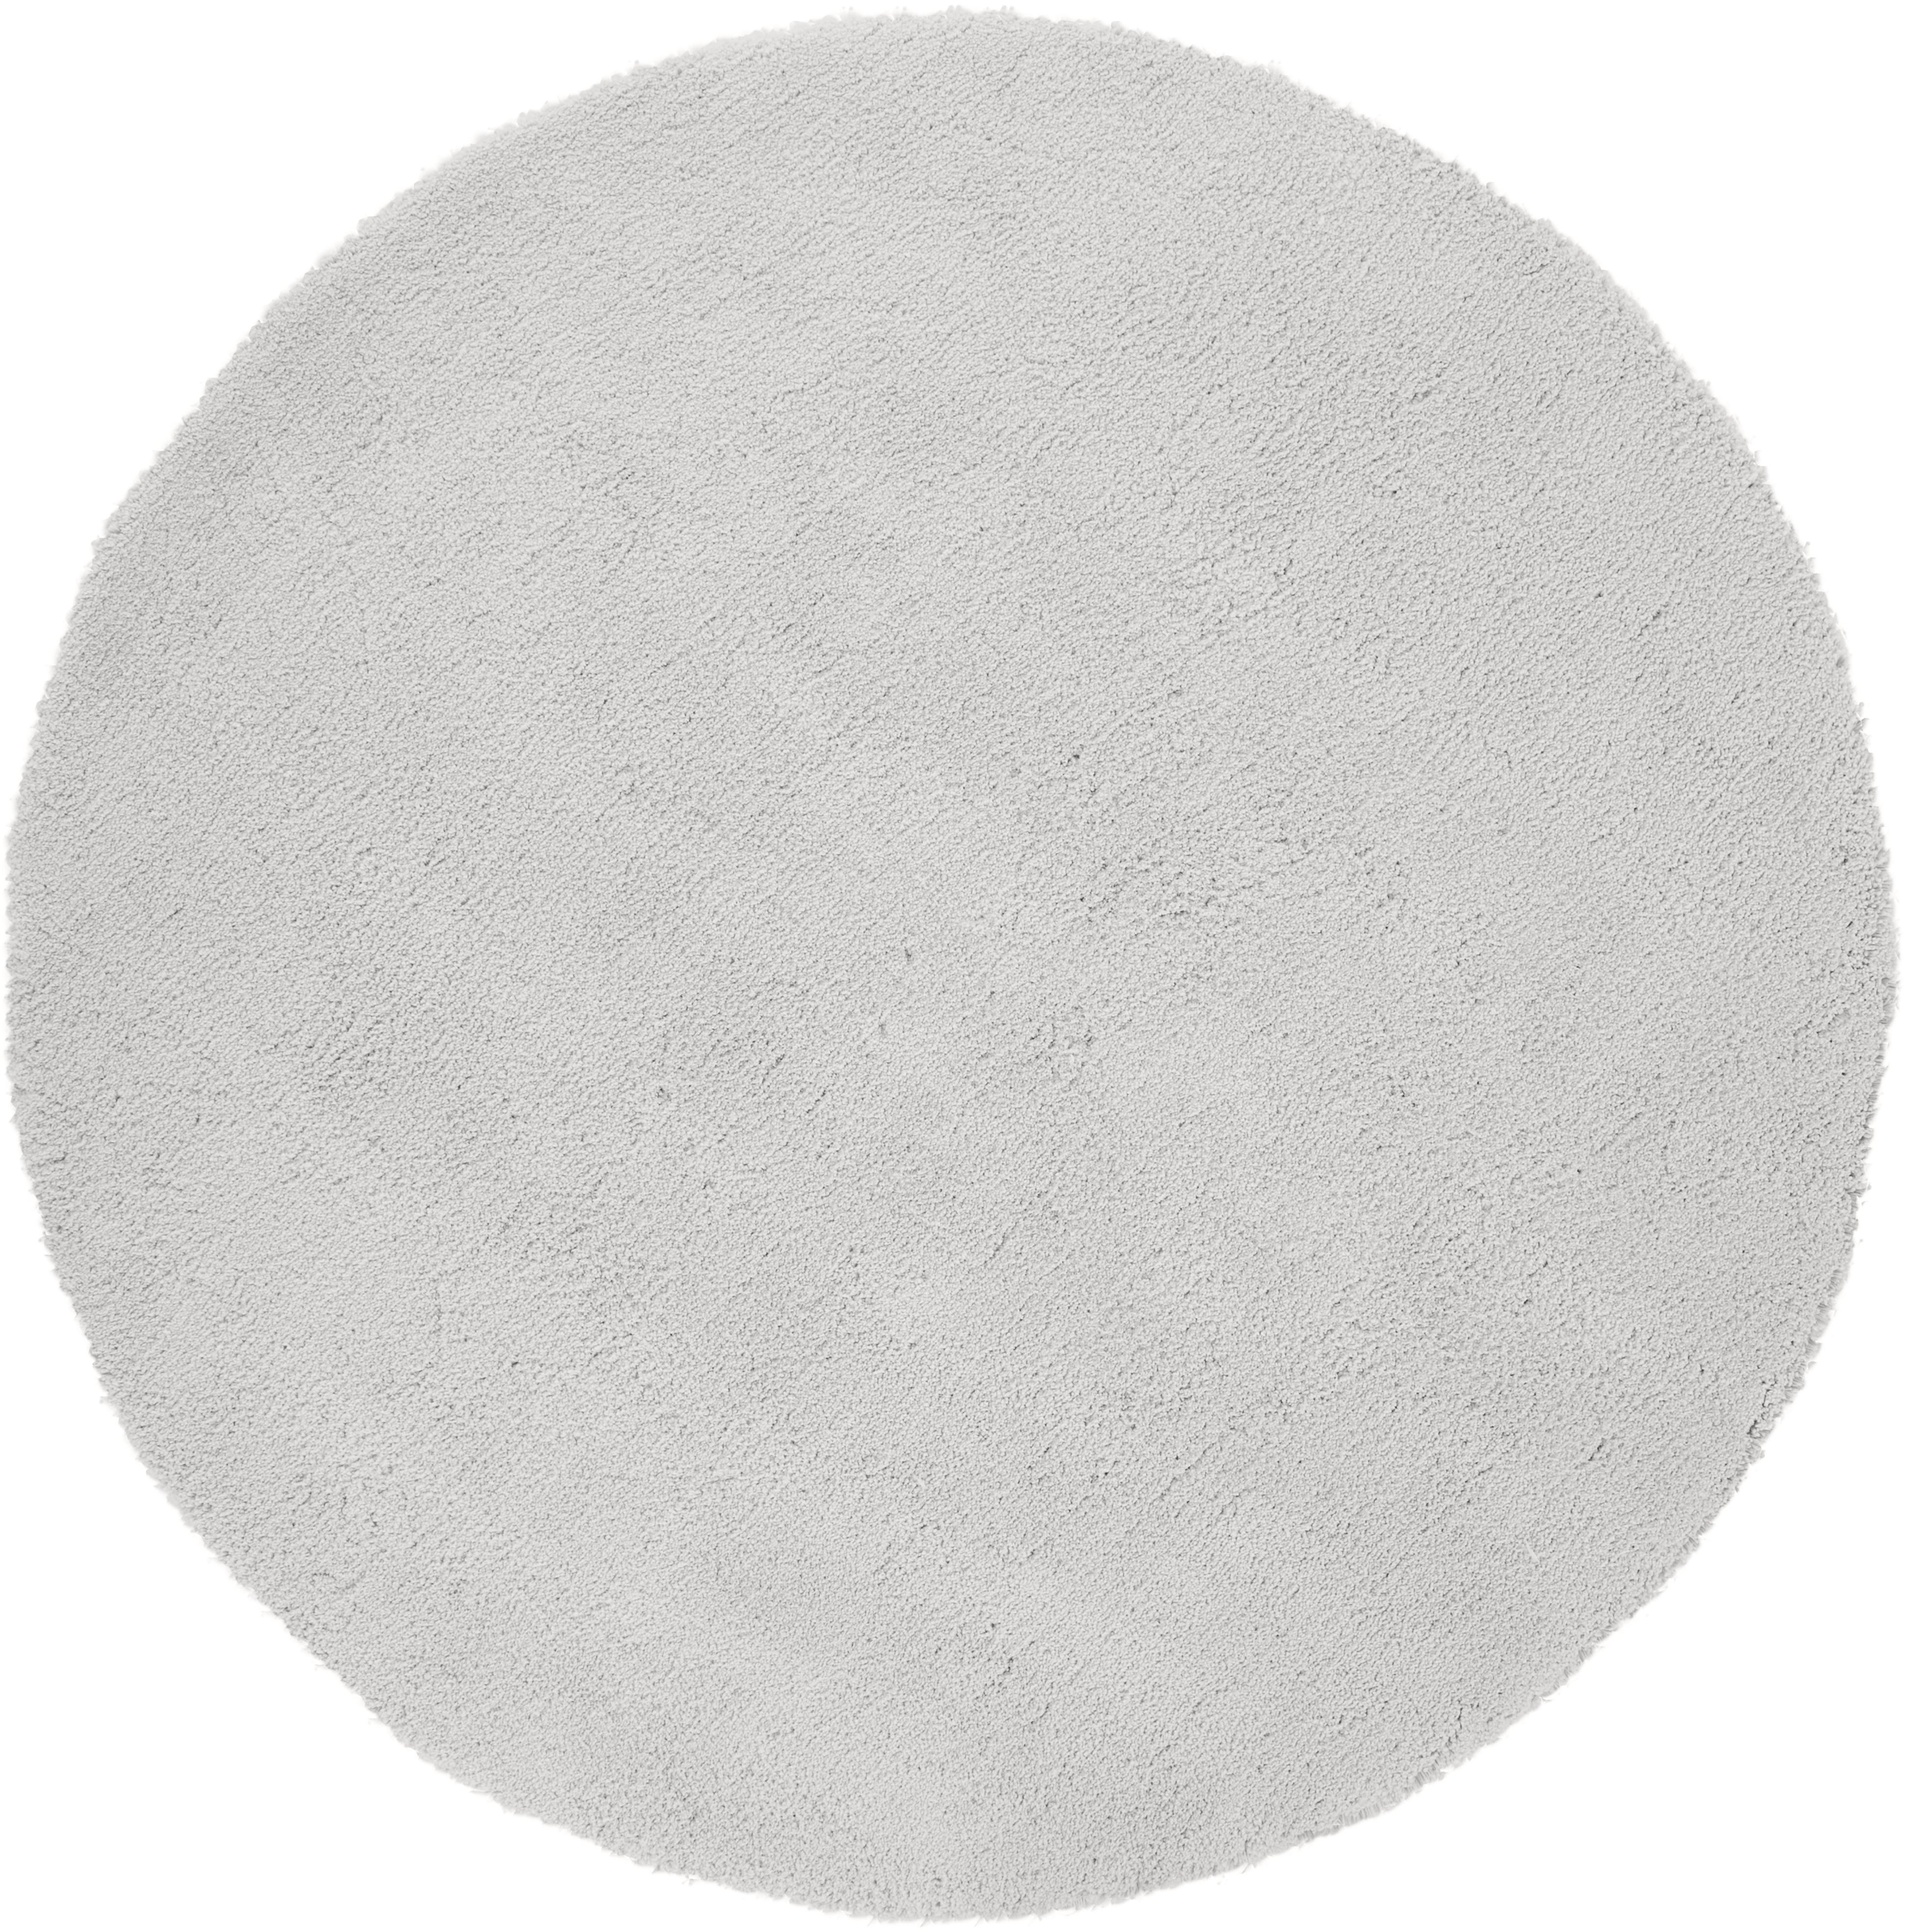 Alfombra redonda de pelo largo Leighton, Parte superior: 100%poliéster (microfibr, Reverso: 70%poliéster, 30%algodó, Gris claro, Ø 200 cm (Tamaño L)